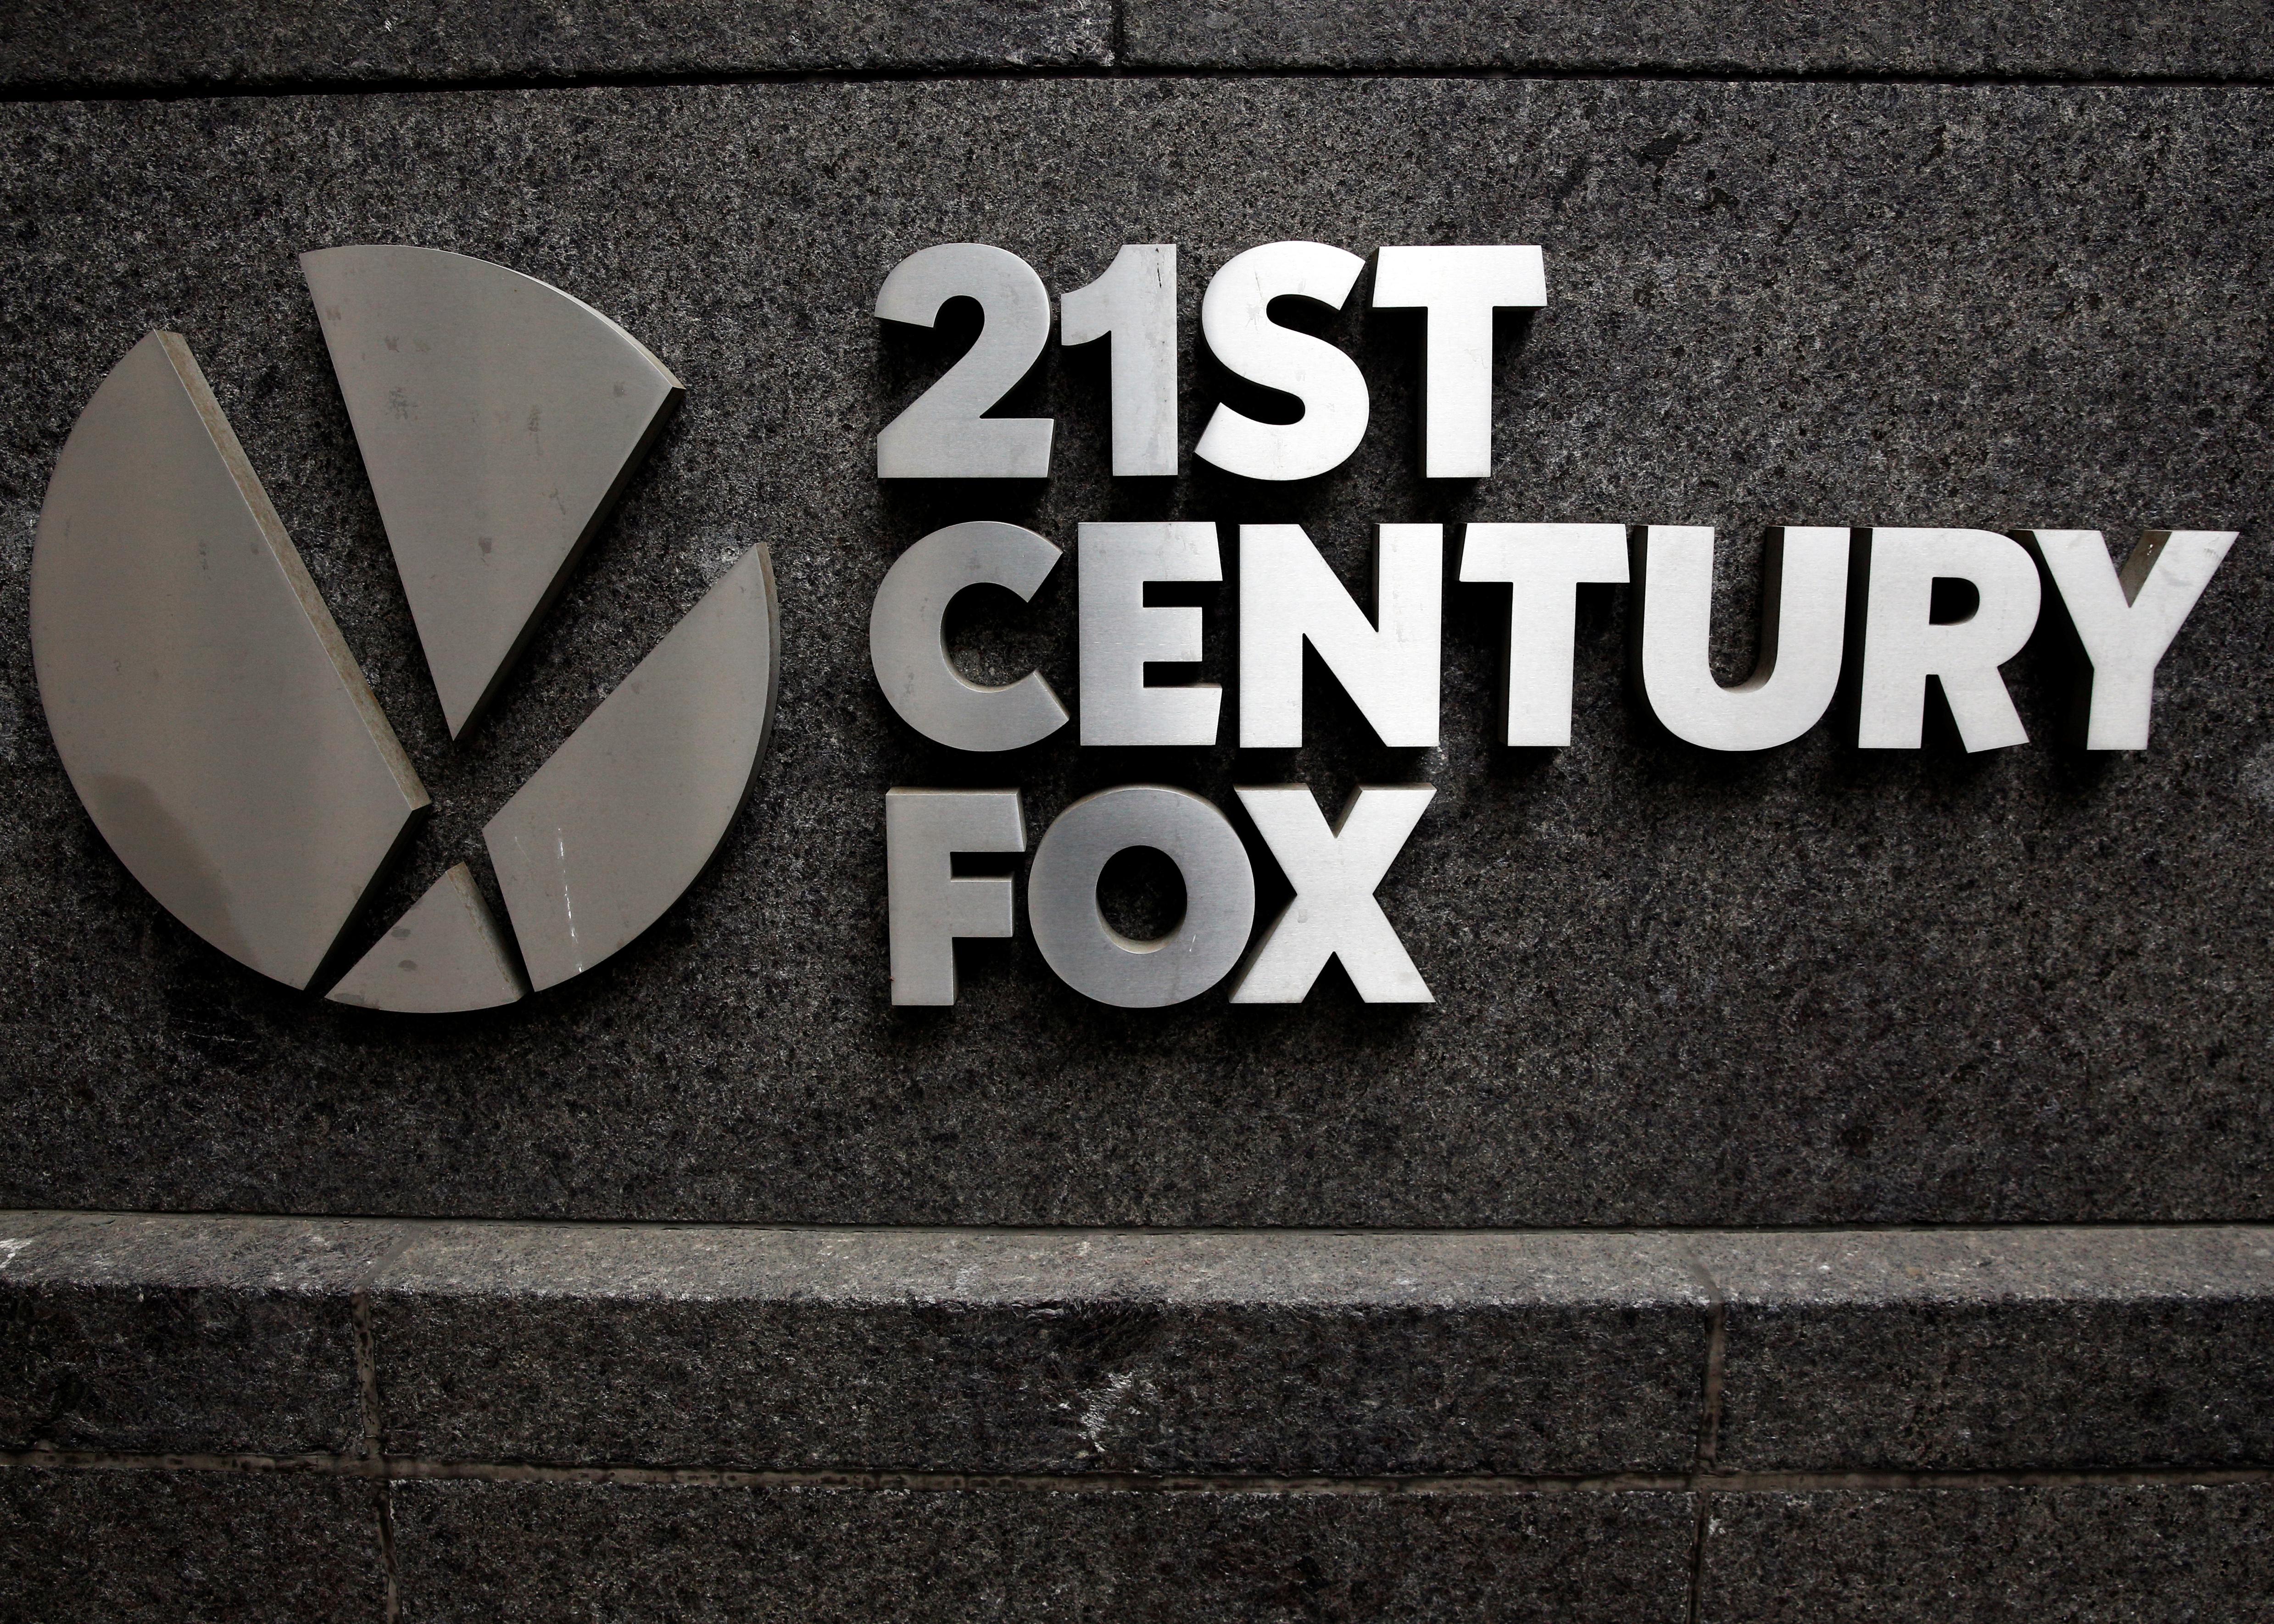 Fox, Blackstone Reportedly Bidding for Tribune Media